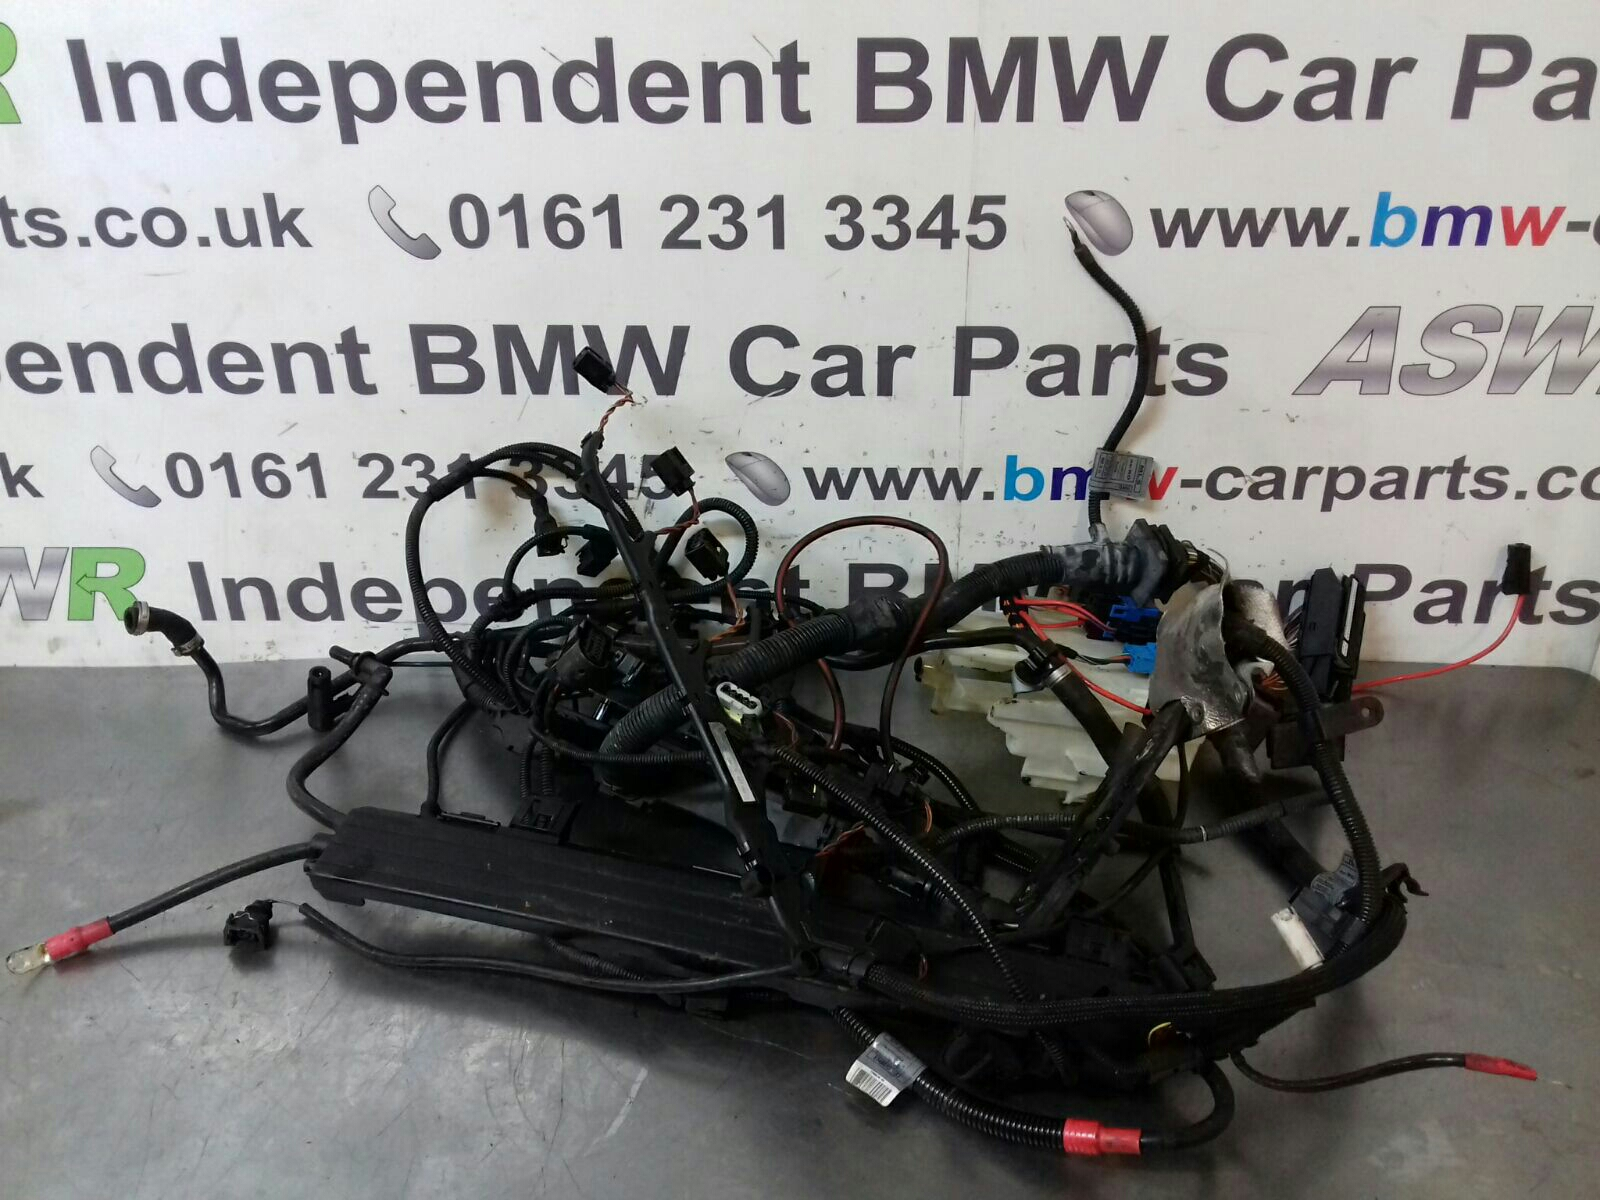 BMW E90 3 SERIES MANUAL Engine Wiring Loom 12517802567 breaking for Bmw N Engine Wiring Harness on bmw e28 engine swap, 1983 bmw 320i engine, bmw 535i engine, bmw m52 engine, bmw m40 engine, 98 bmw 528i engine, bmw s38 engine, bmw n42 engine, bmw m42 engine, bmw m50 engine, bmw m44 engine, bmw m57 engine, bmw m43 engine,